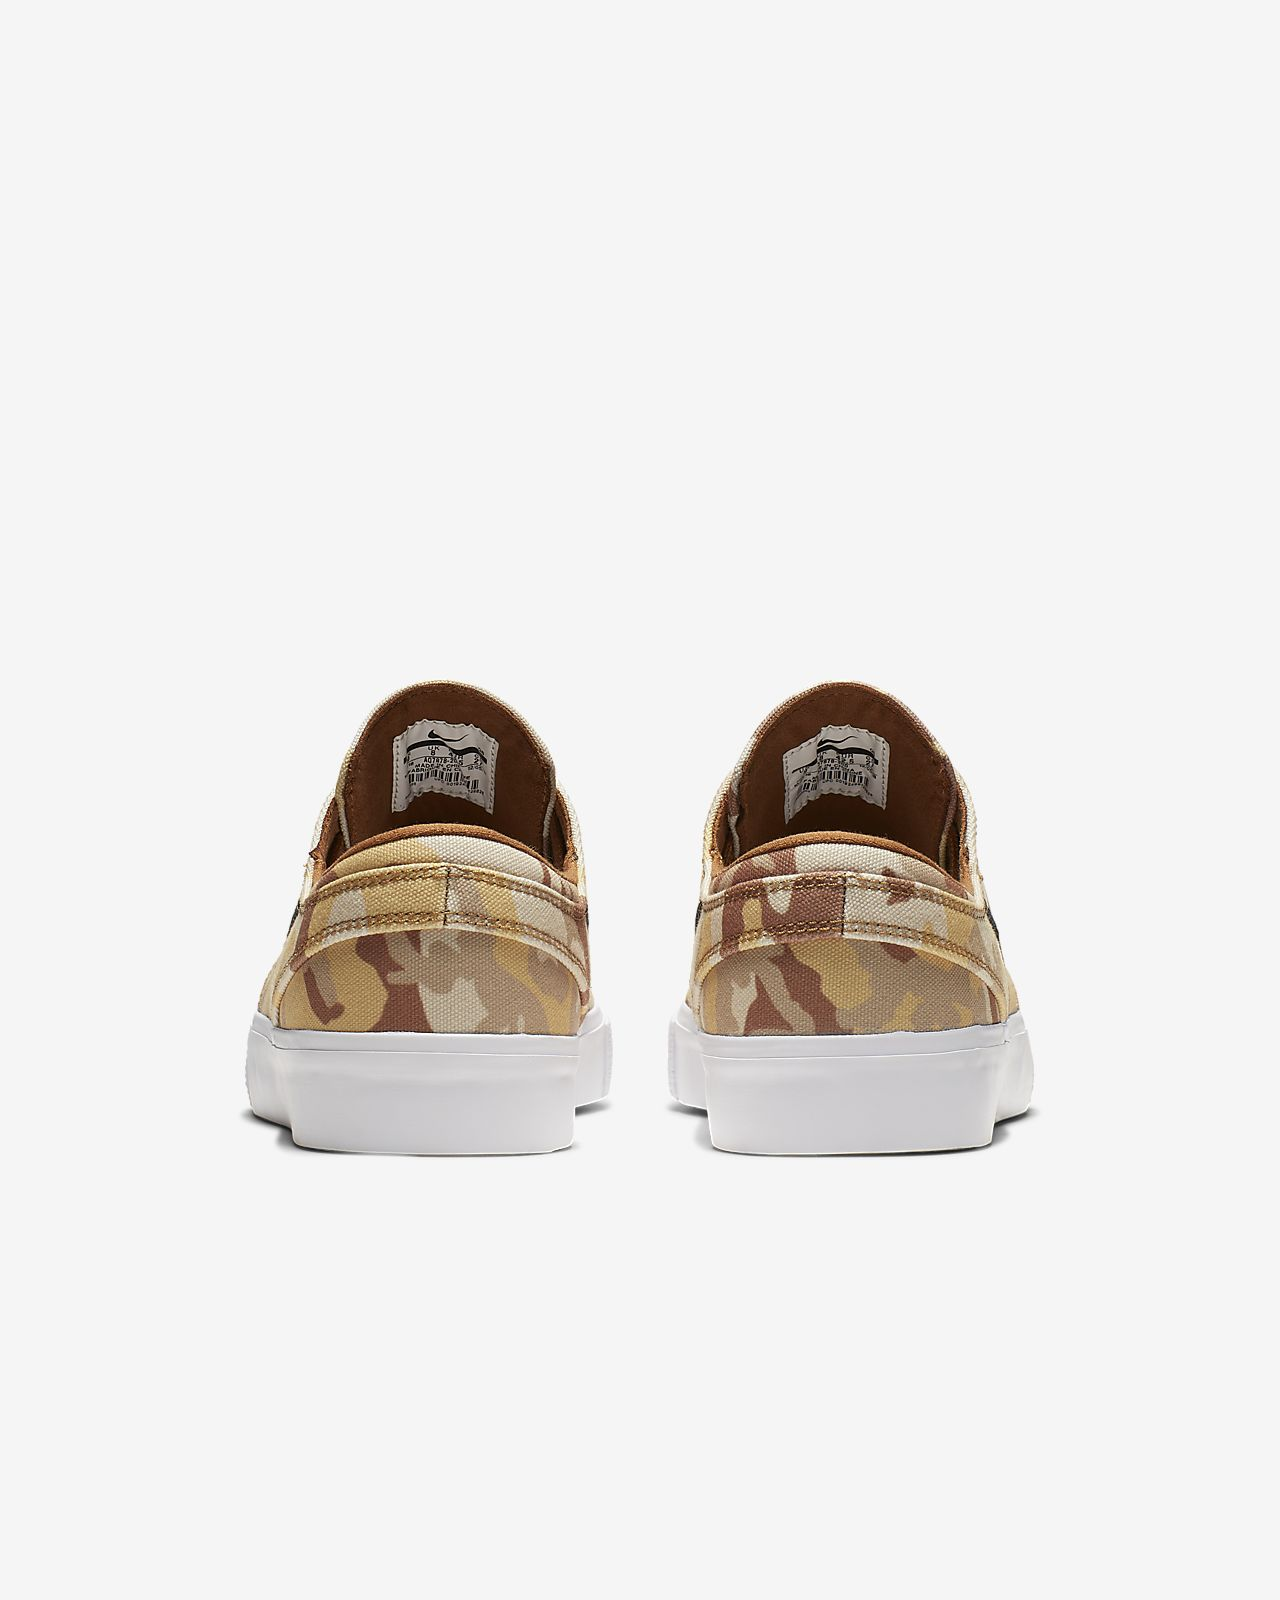 dfa5490213 Nike SB Zoom Stefan Janoski Canvas RM Premium gördeszkás cipő. Nike ...